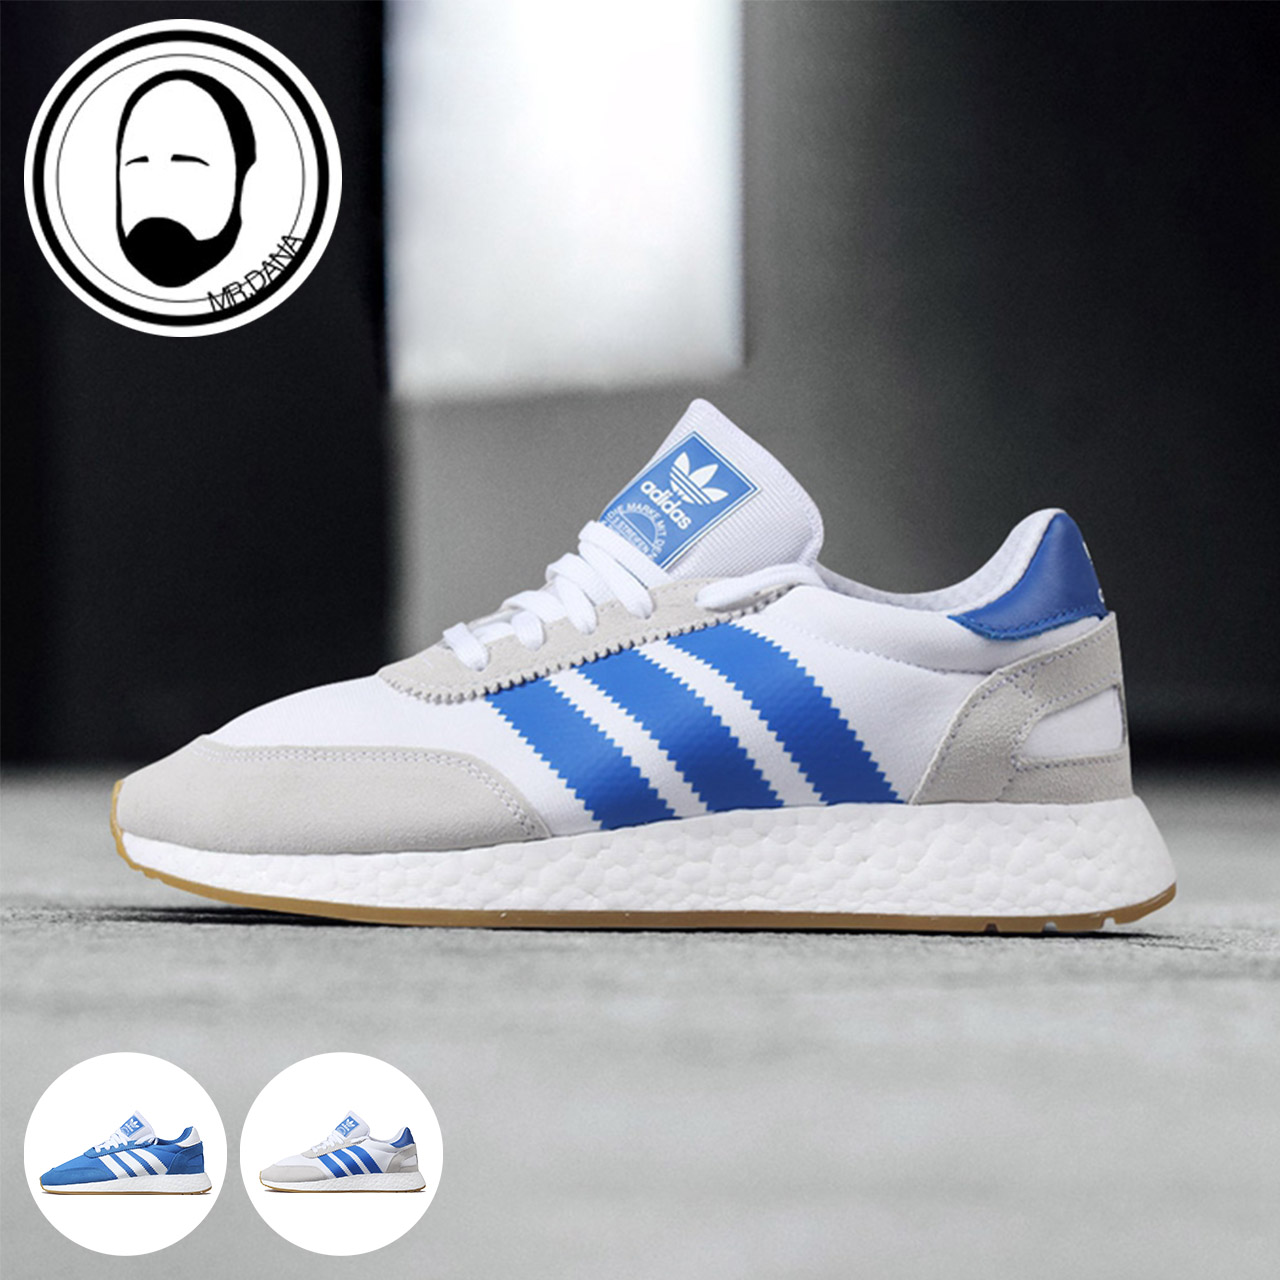 76afd0481345ae 大拿阿迪Adidas I-5923 Boost 灰蓝蓝白休闲跑鞋G54515 G54514